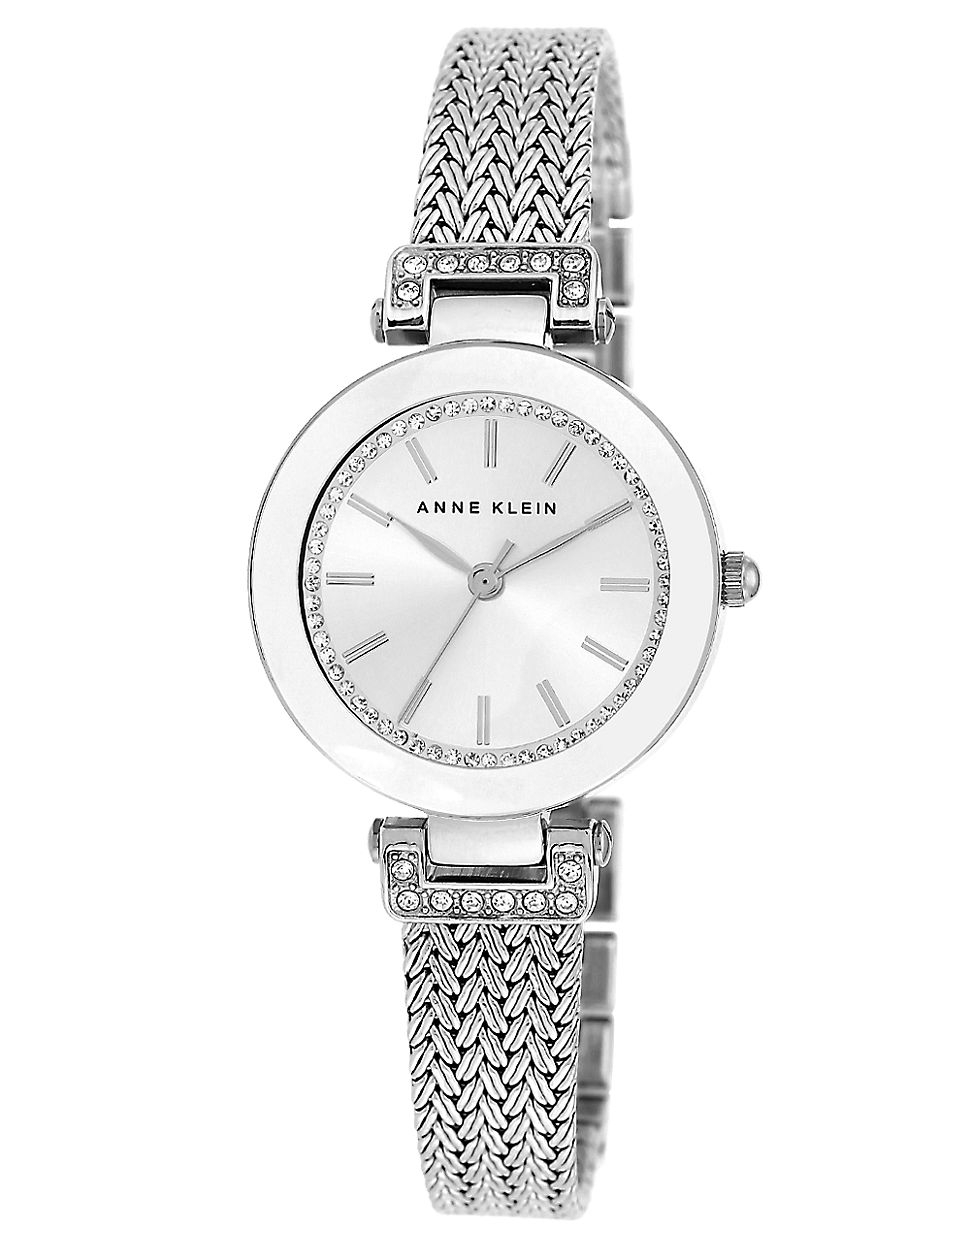 Lyst anne klein ladies silvertone and swarovski crystal braided bracelet watch in metallic for Swarovski crystals watch